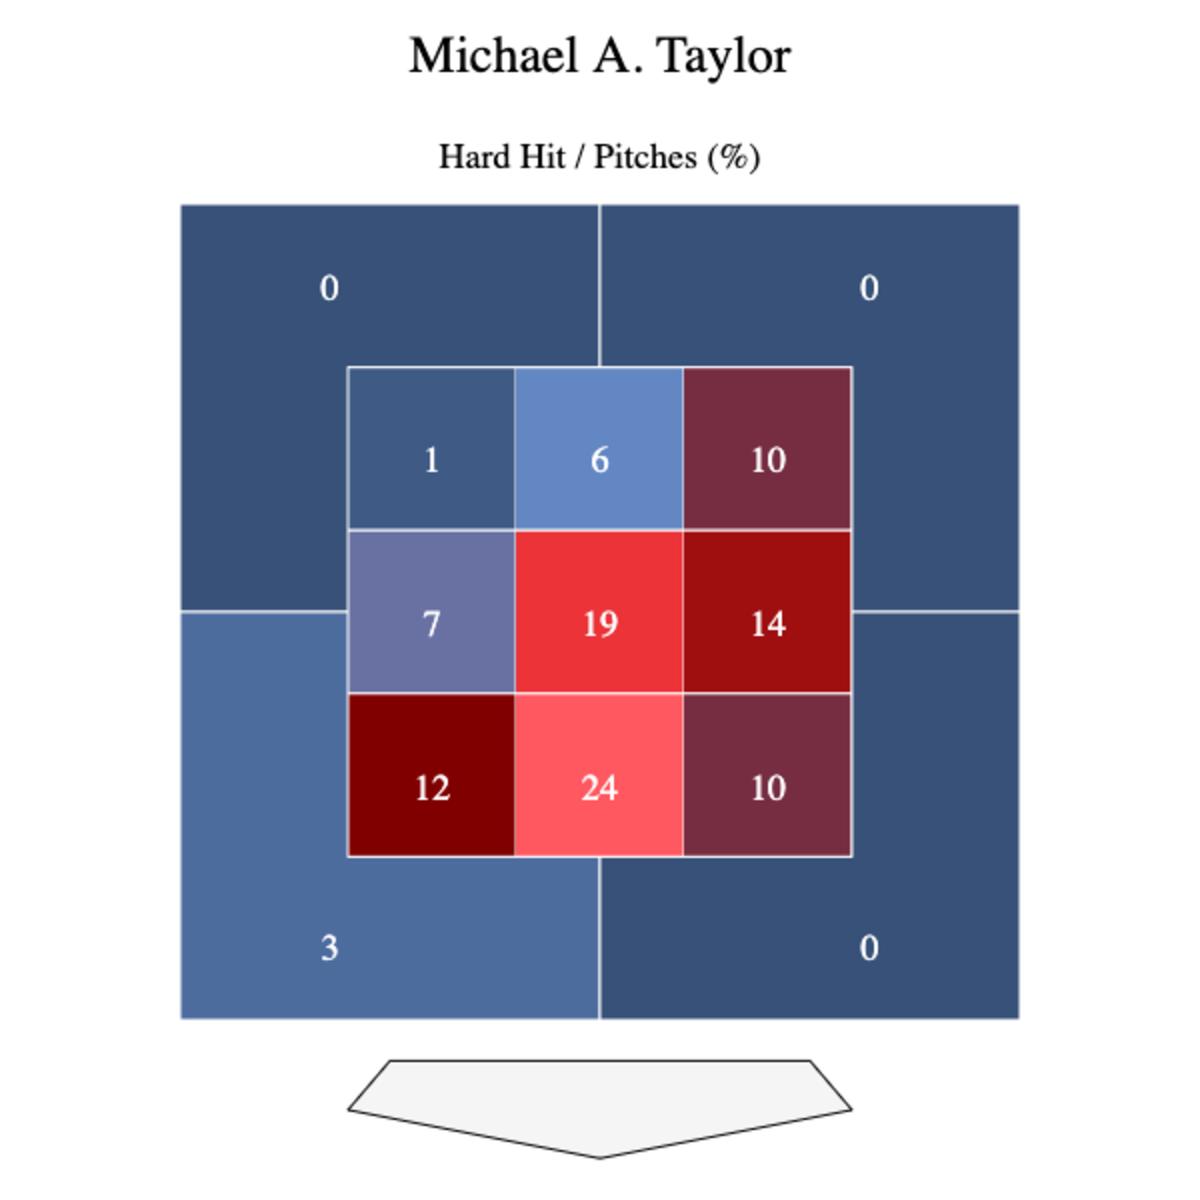 Data from Baseball Savant.